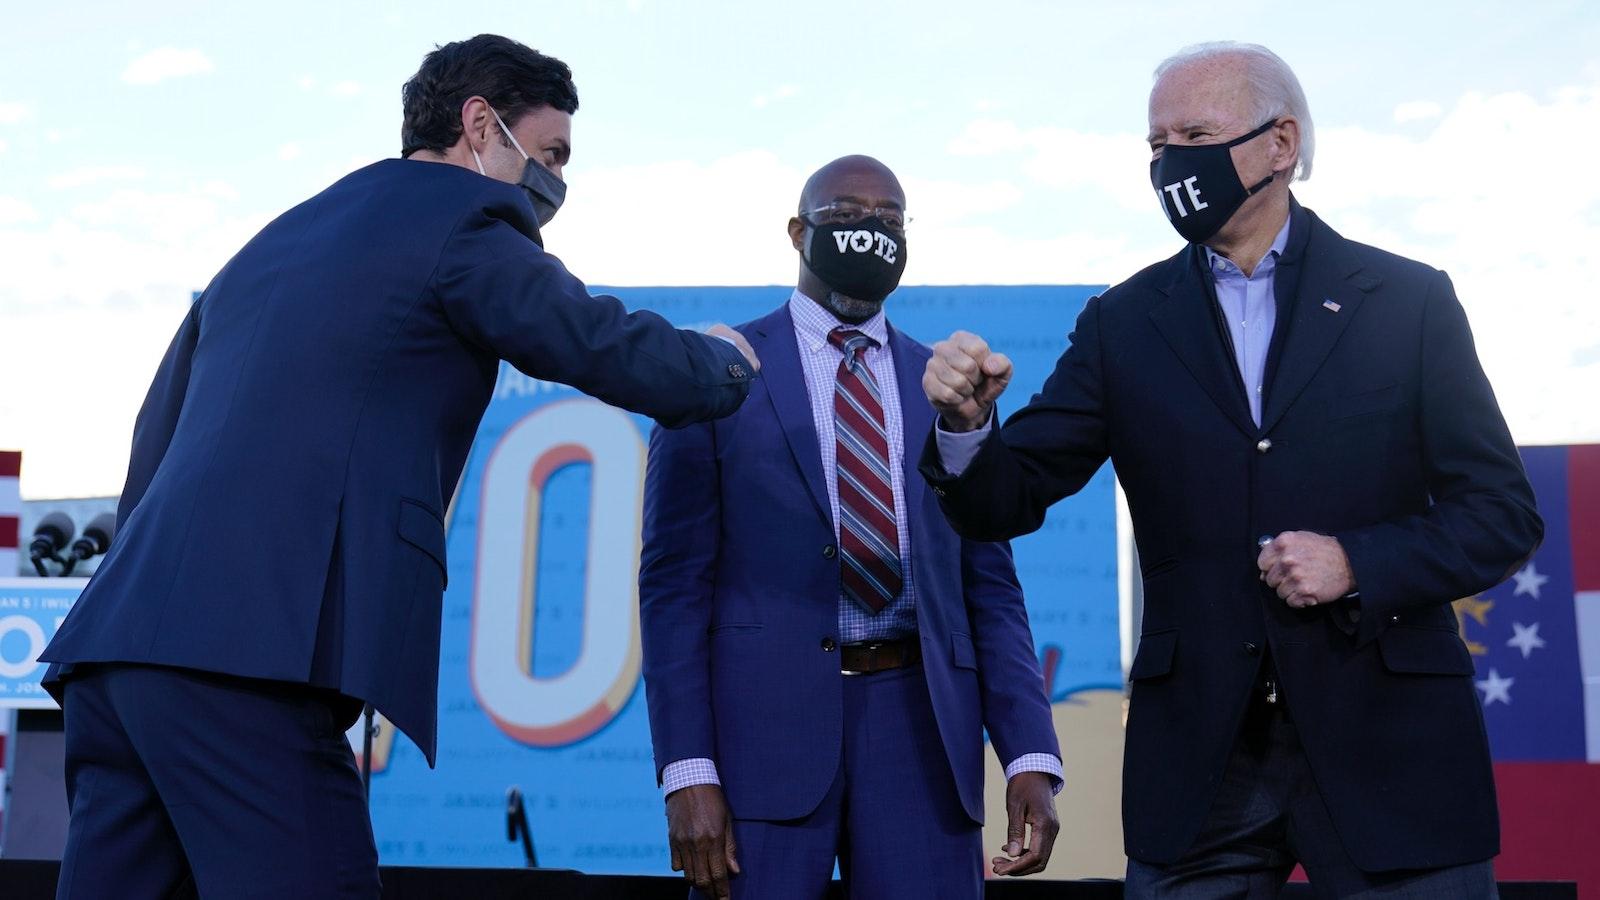 President-elect Joe Biden campaigned in Atlanta on Monday with then-Senate candidates Raphael Warnock, center, and Jon Ossoff, left. Photo: AP